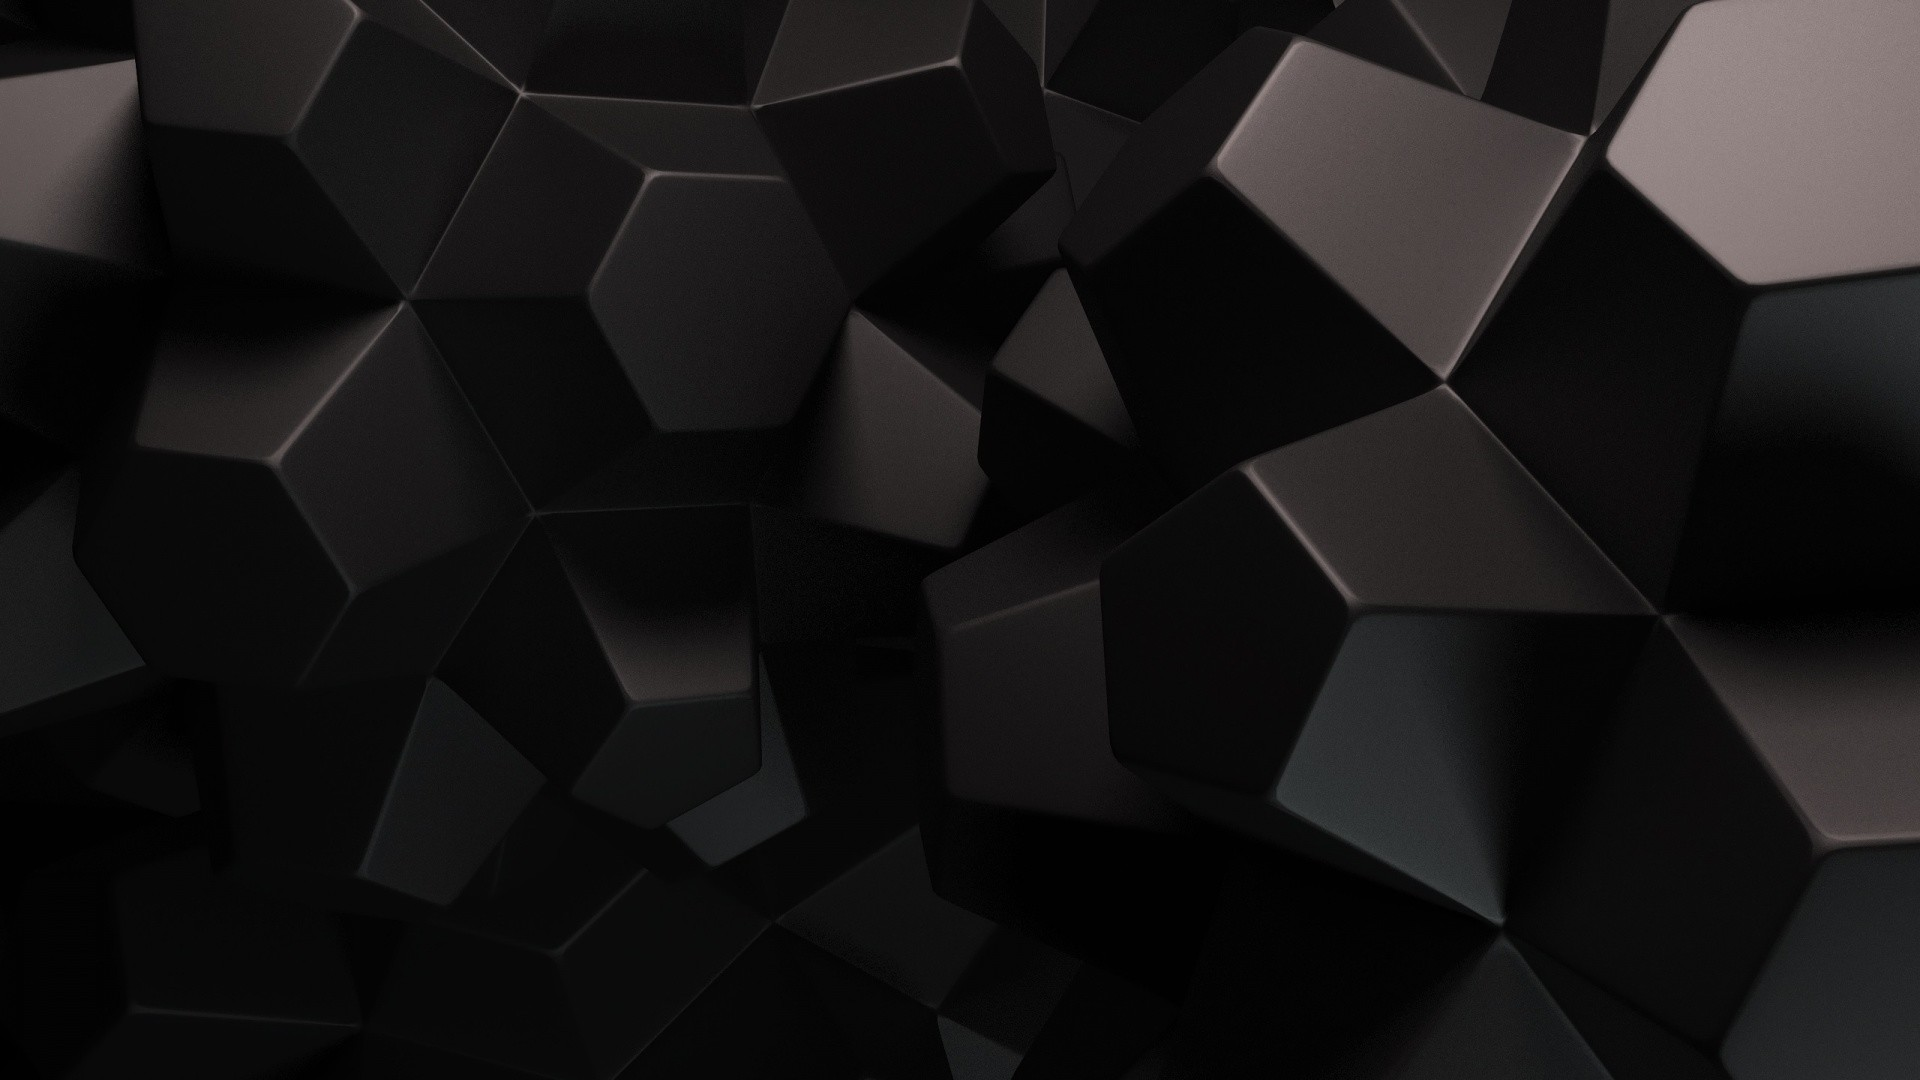 Black Abstract Wallpaper 1920×1080